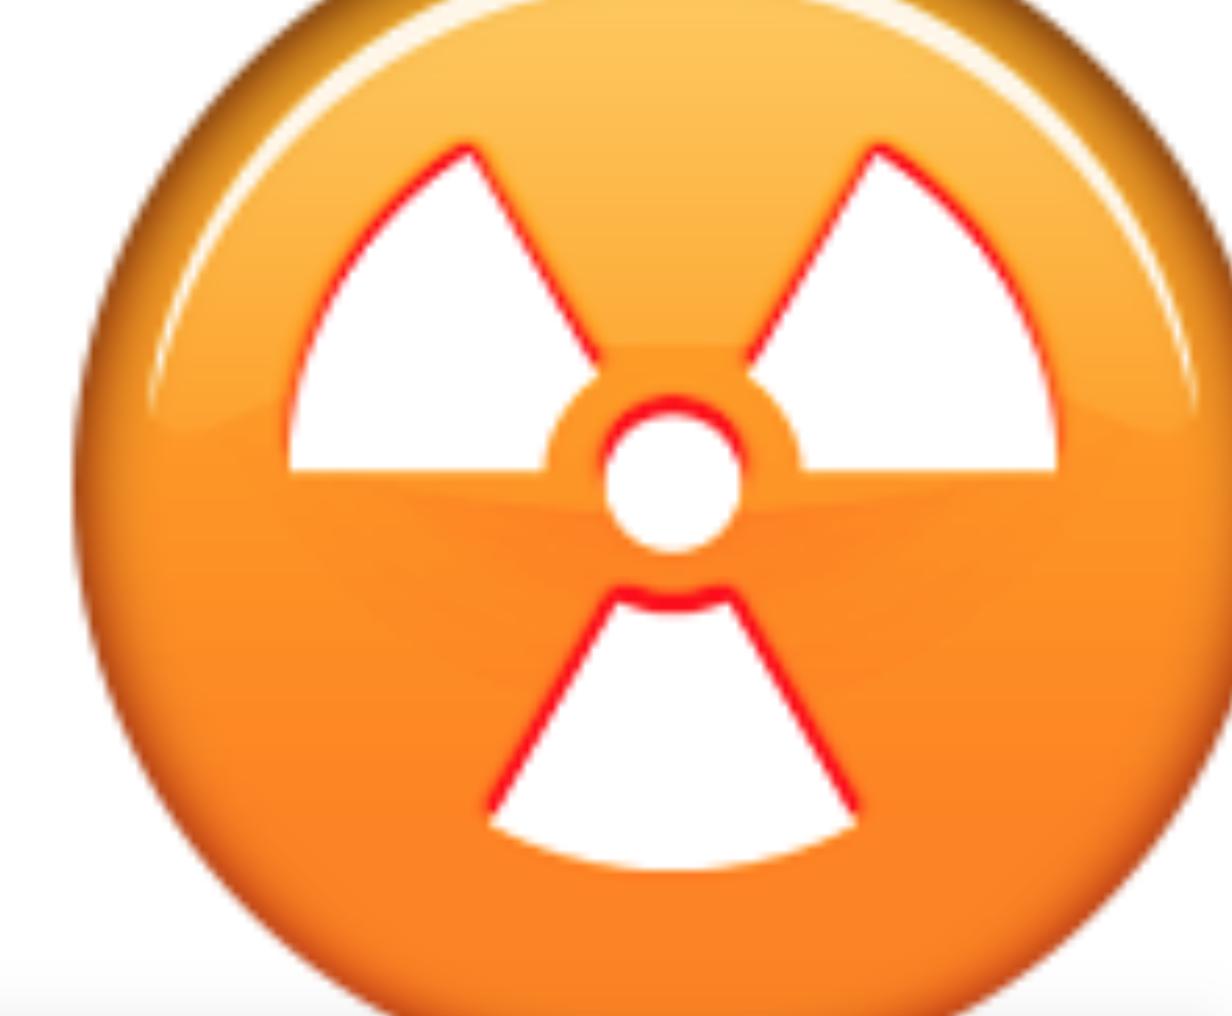 Radioactive Blob Text Blob Wiki Fandom Powered By Wikia